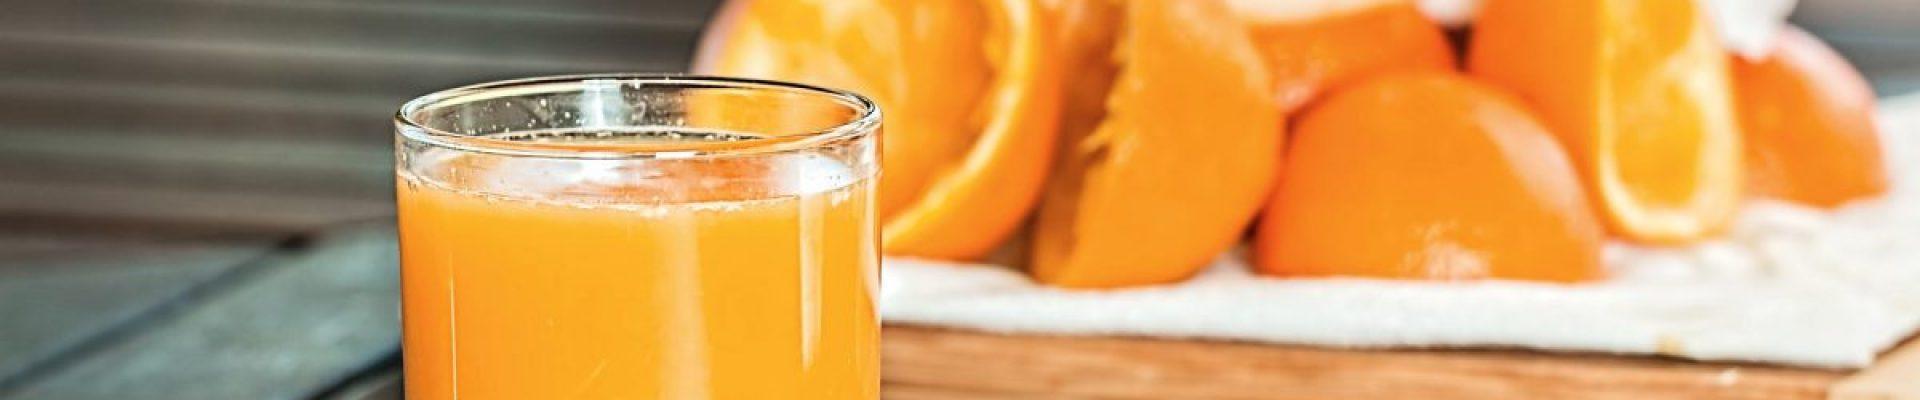 Zumo-de-Naranja-Natural-1200x480